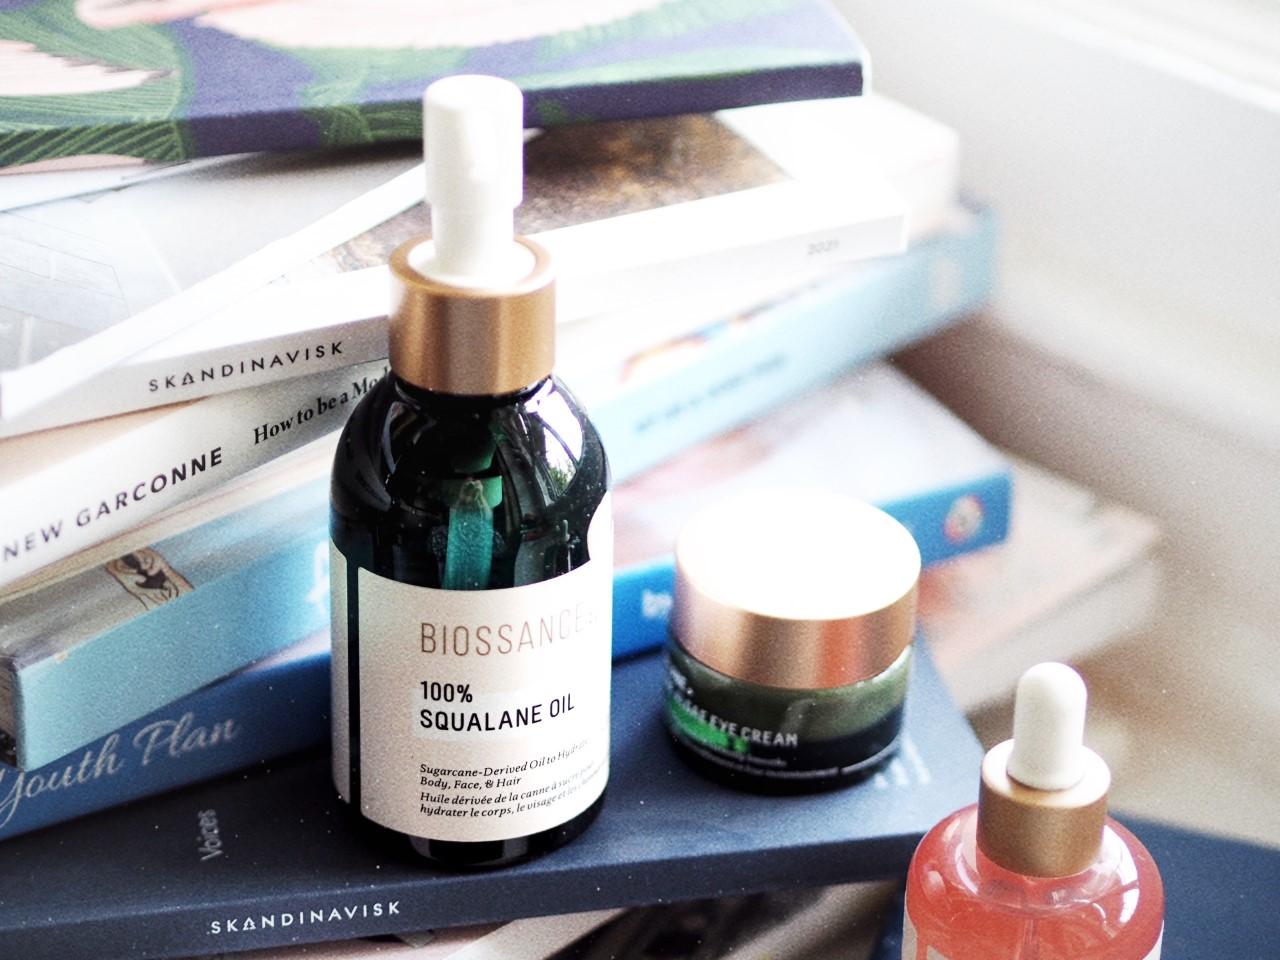 TEN Ways To Use Biossance 100% Squalane Oil